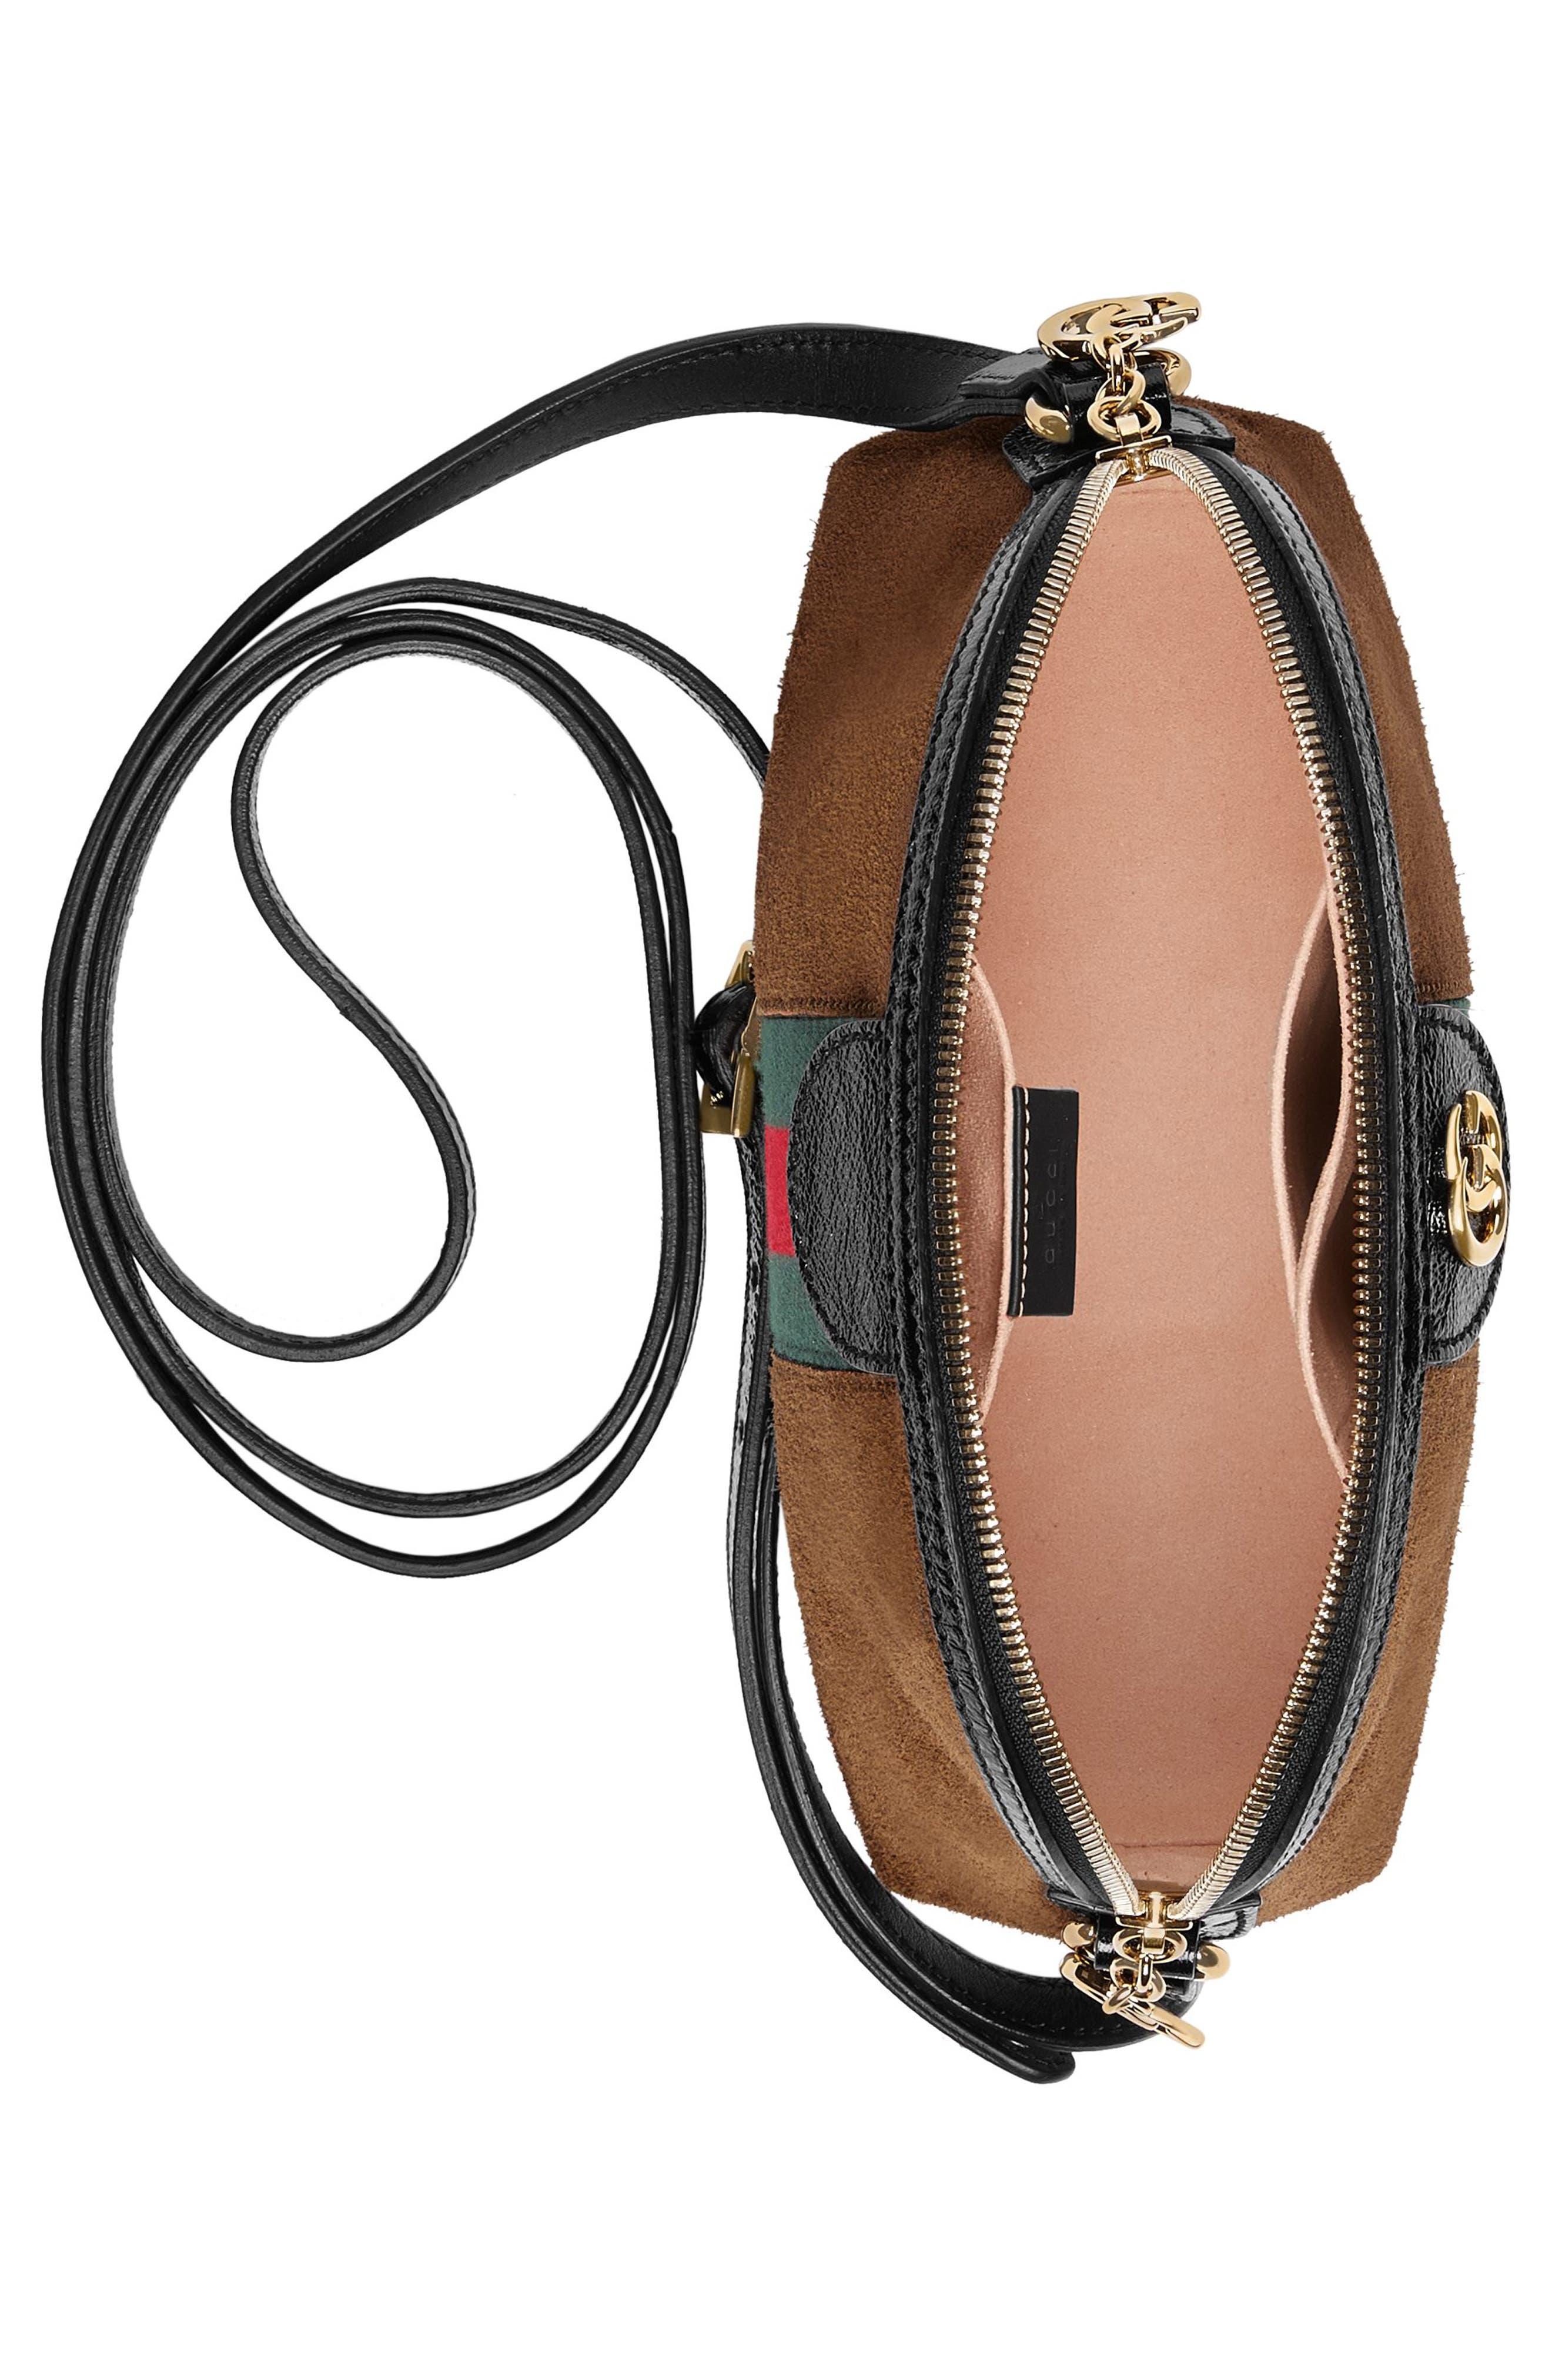 Small Suede Shoulder Bag,                             Alternate thumbnail 3, color,                             Nocciola/ Nero/ Vert Red Vert